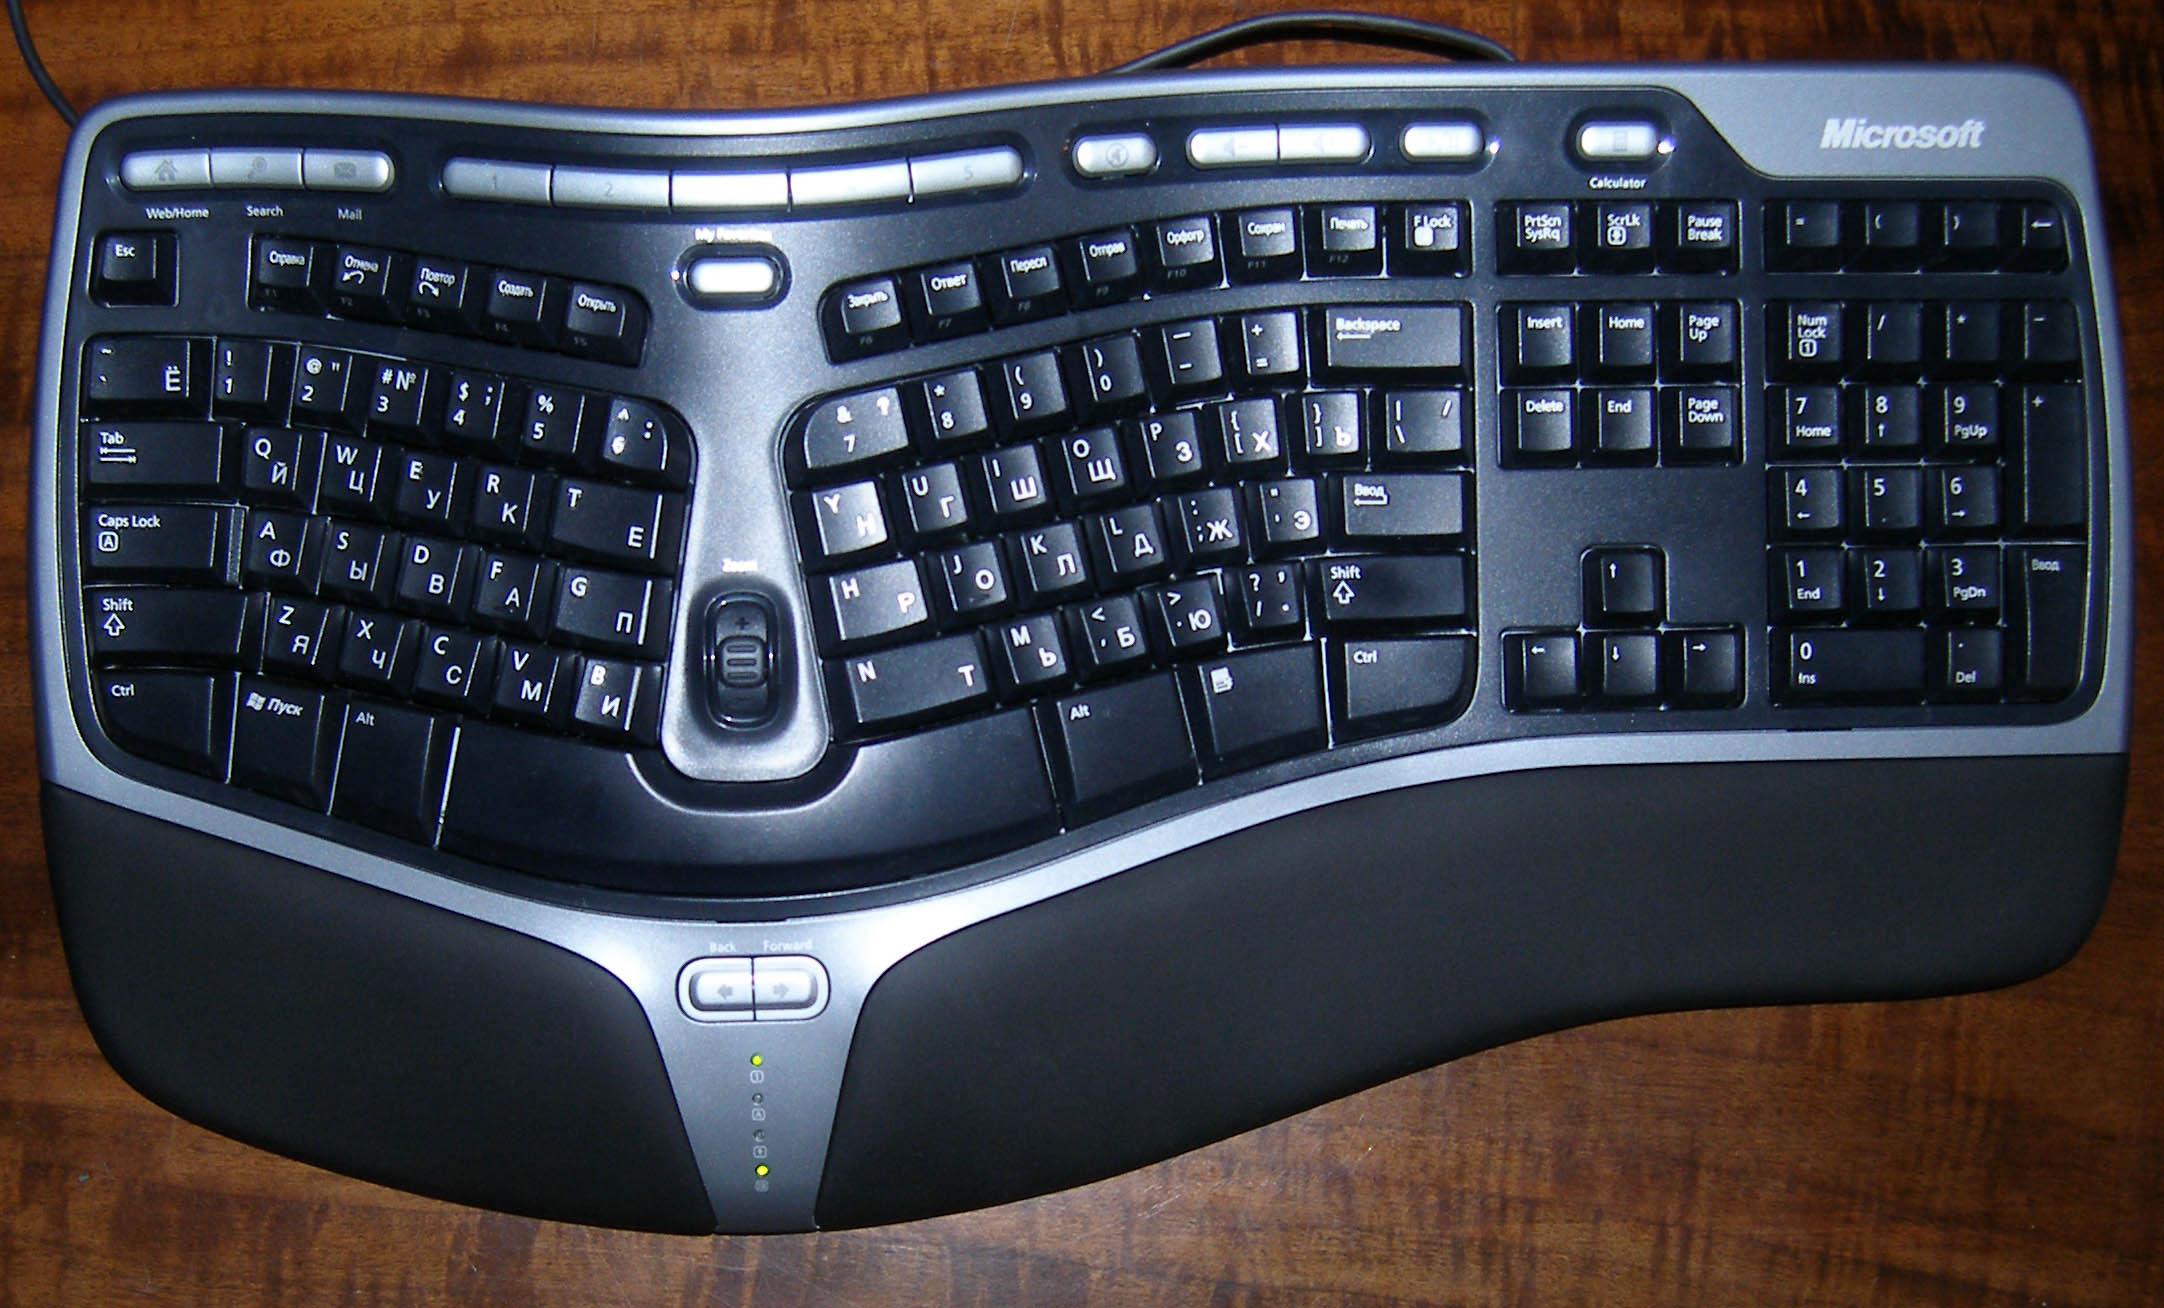 Microsoft Natural Ergonomic Keyboard  Black Bm